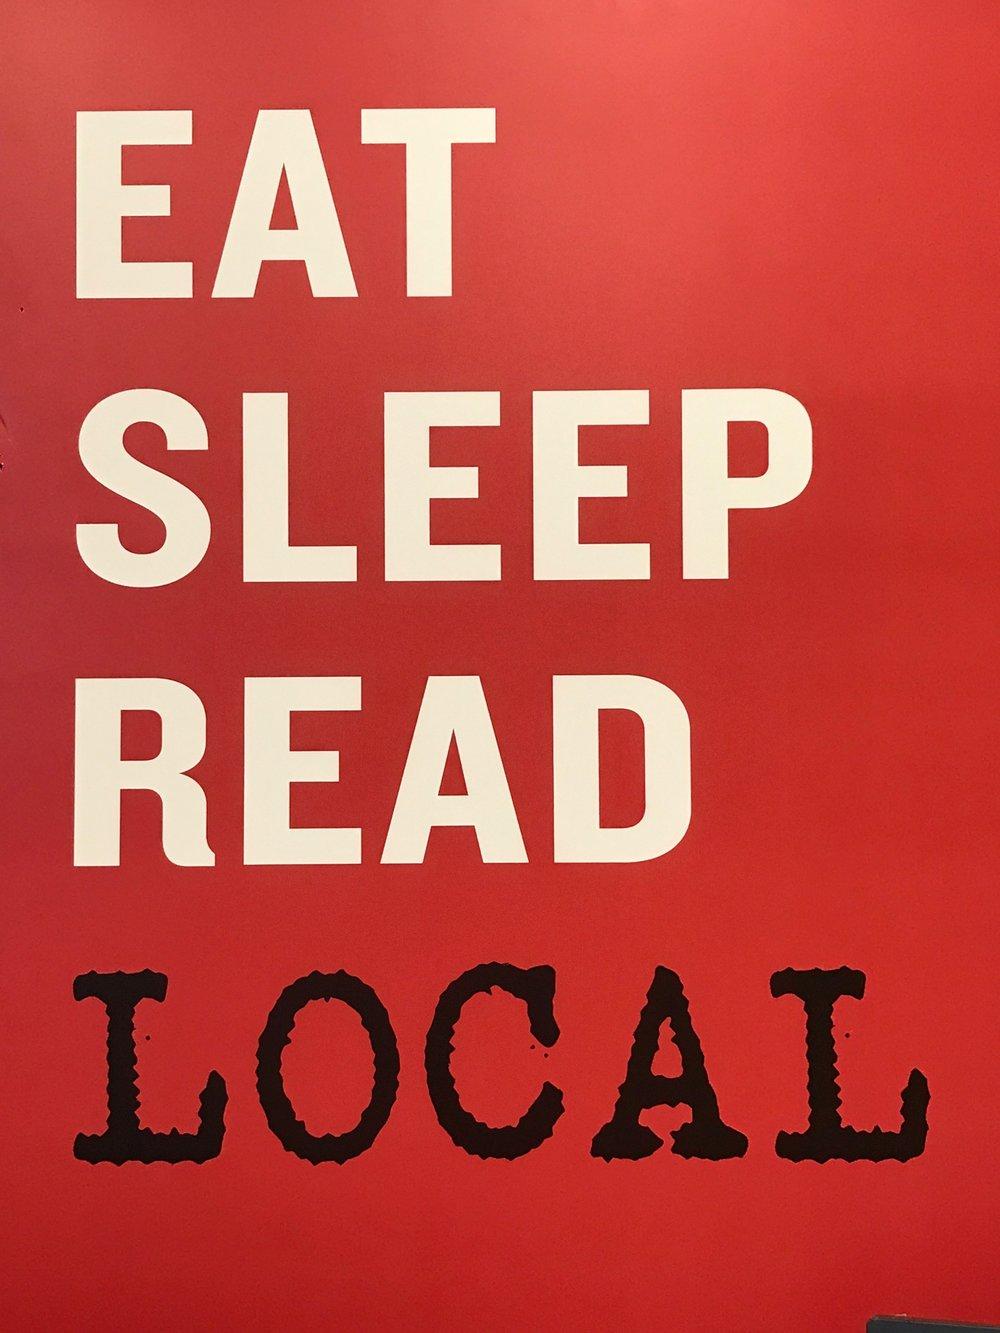 read local.JPG